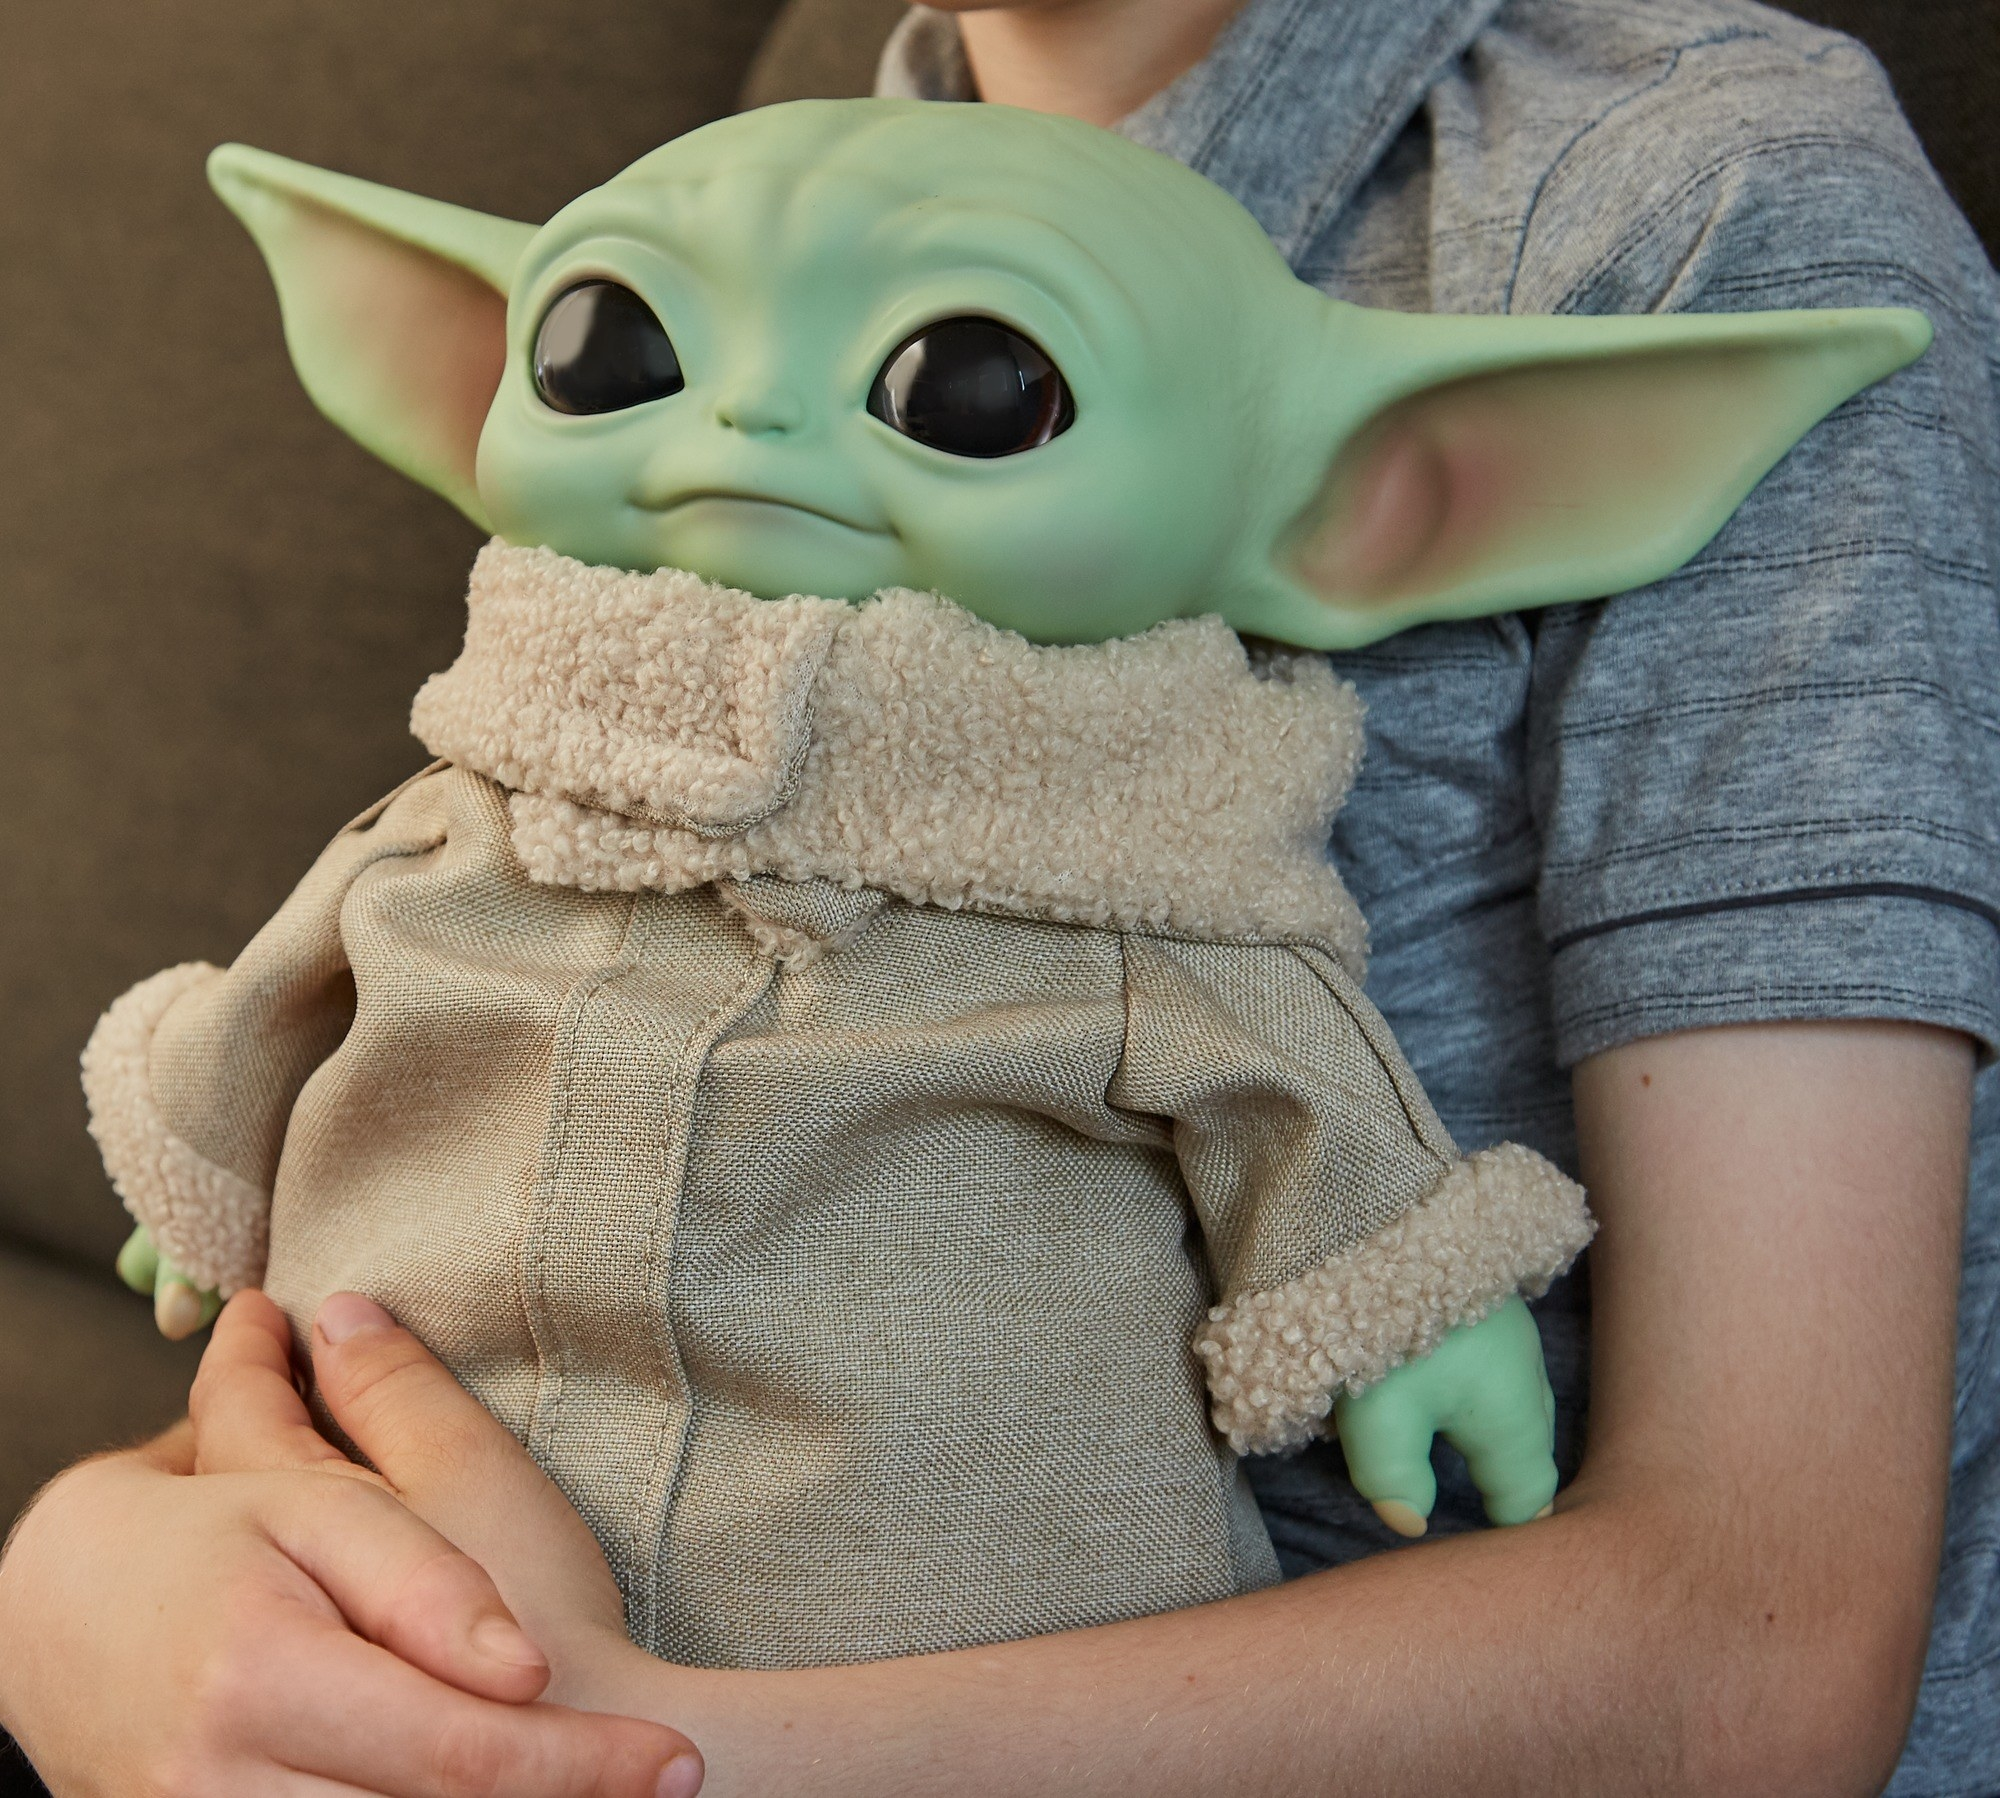 child hugging a baby yoda plush toy